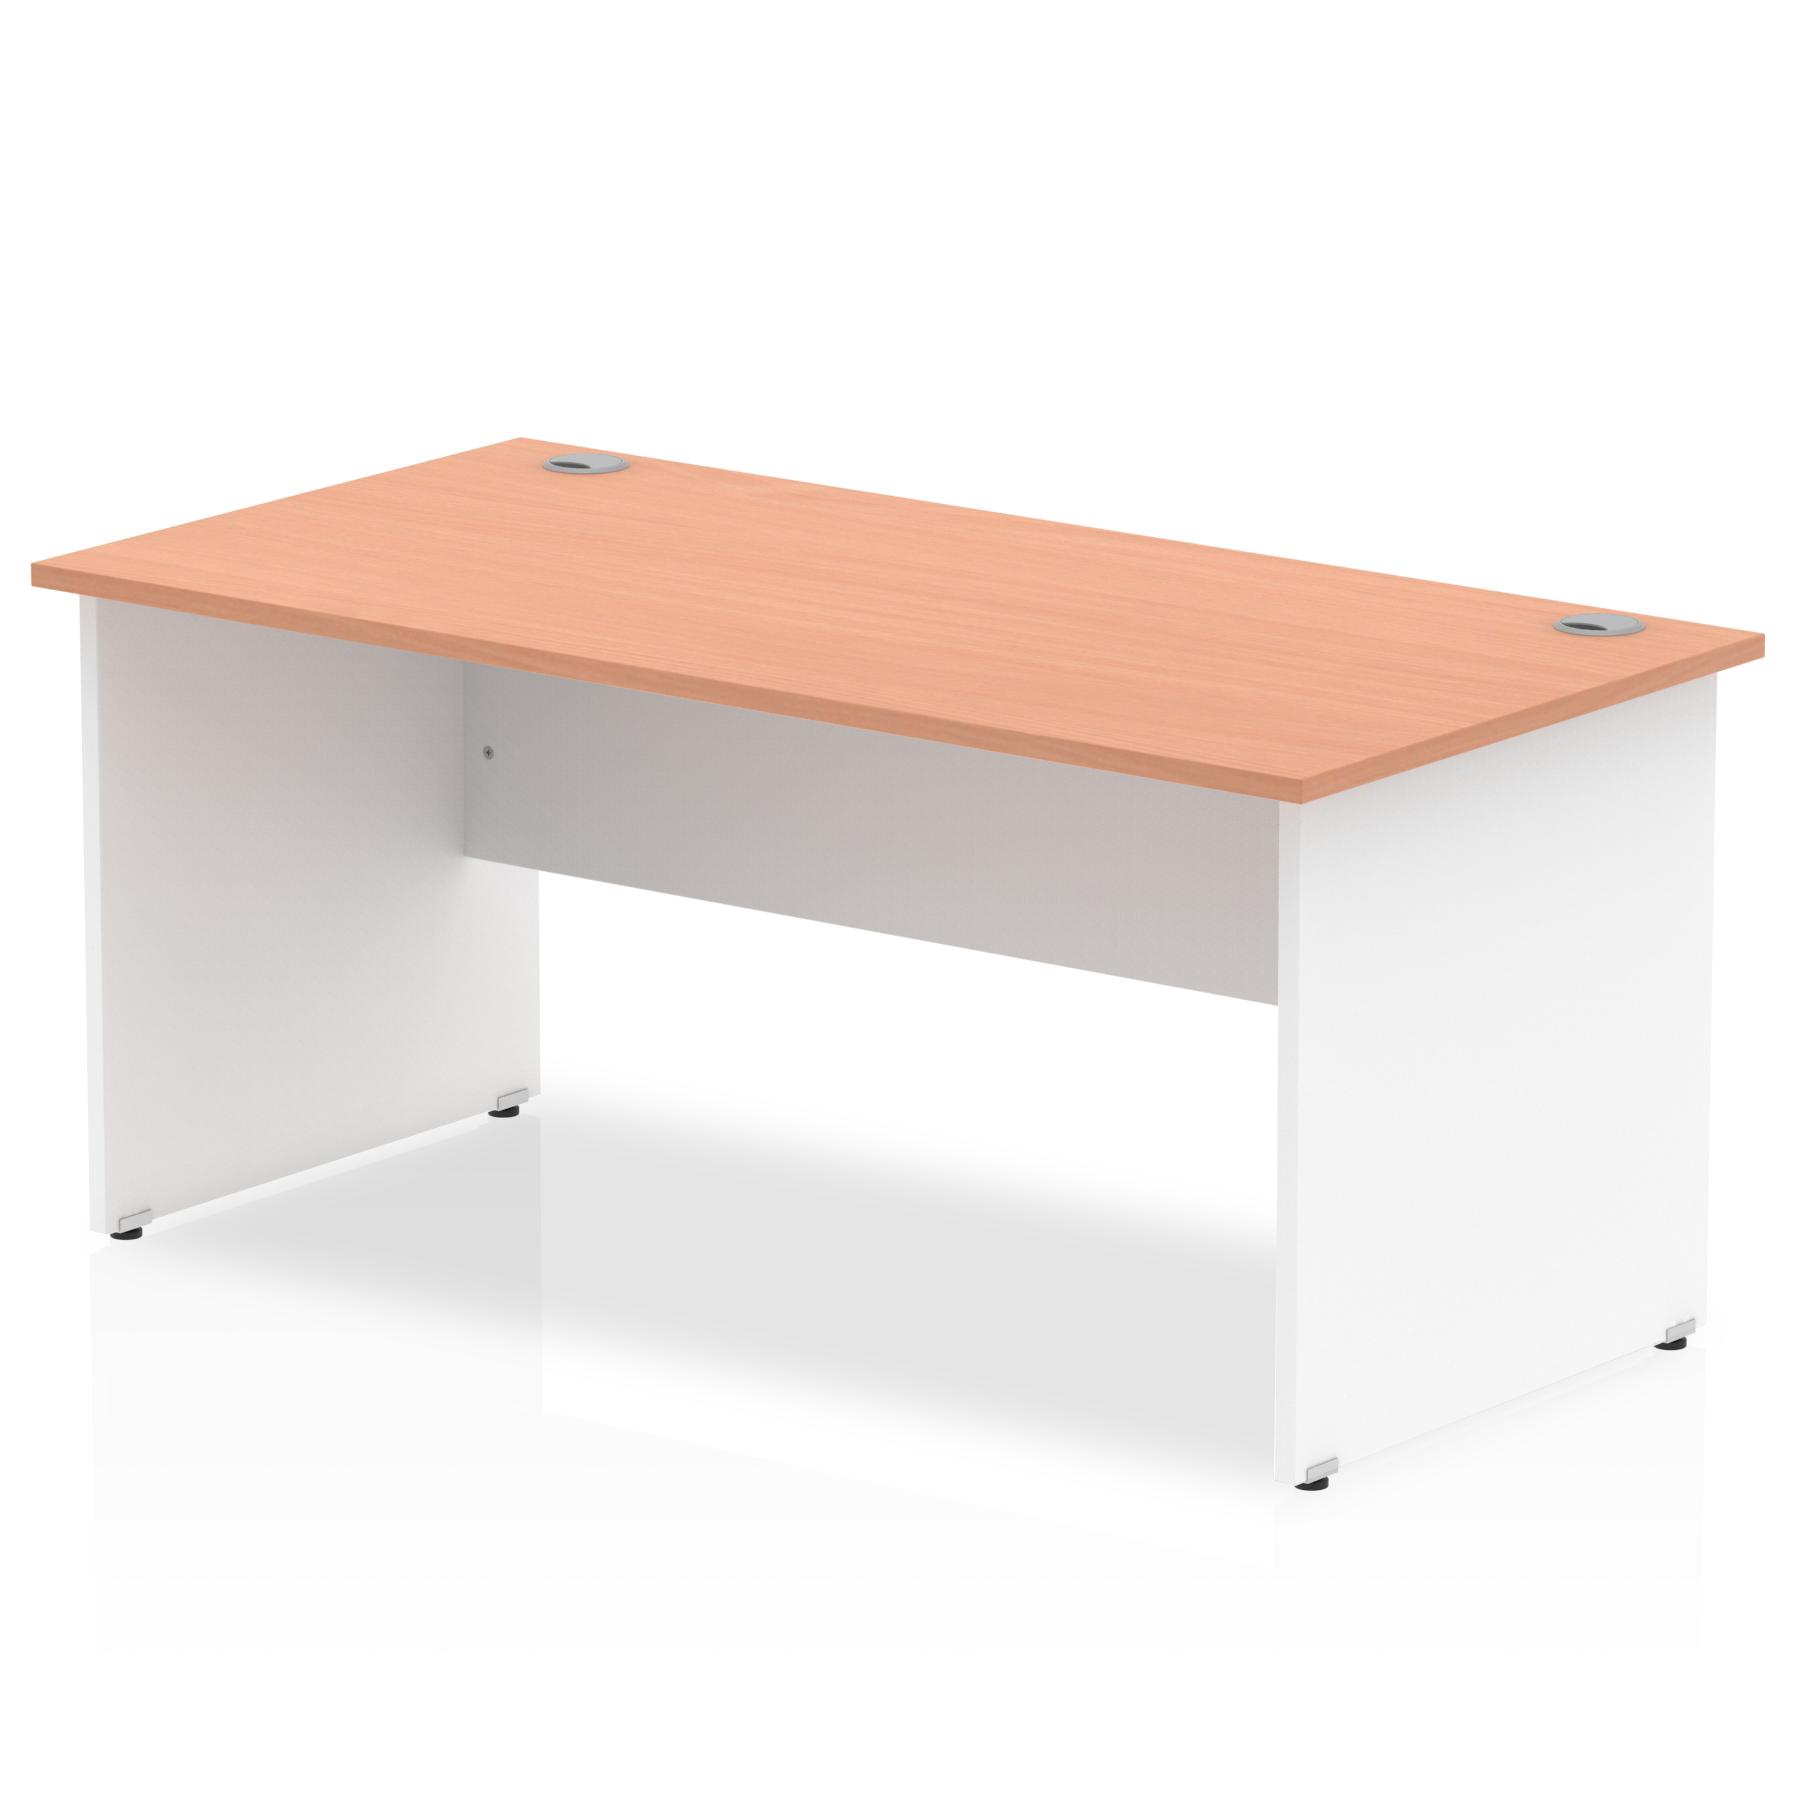 Trexus Desk Rectangle Panel End 1800x800mm Beech Top White Panels Ref TT000021